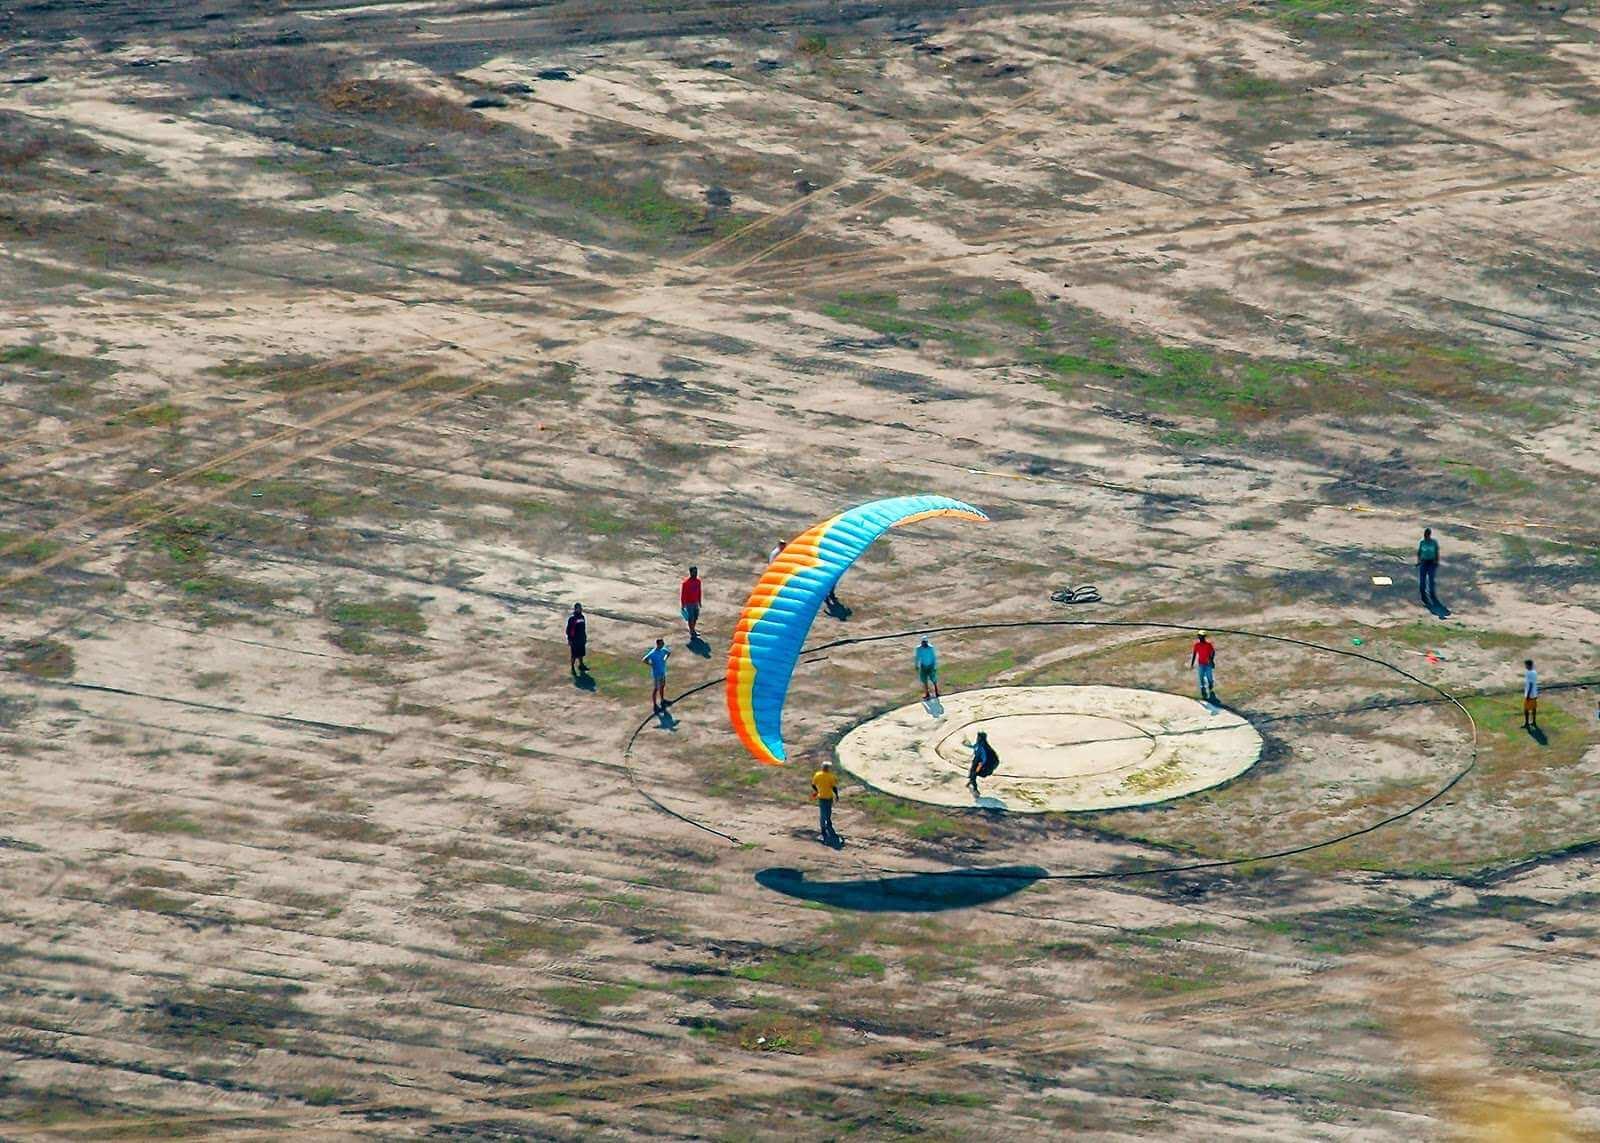 Paragliding landing area